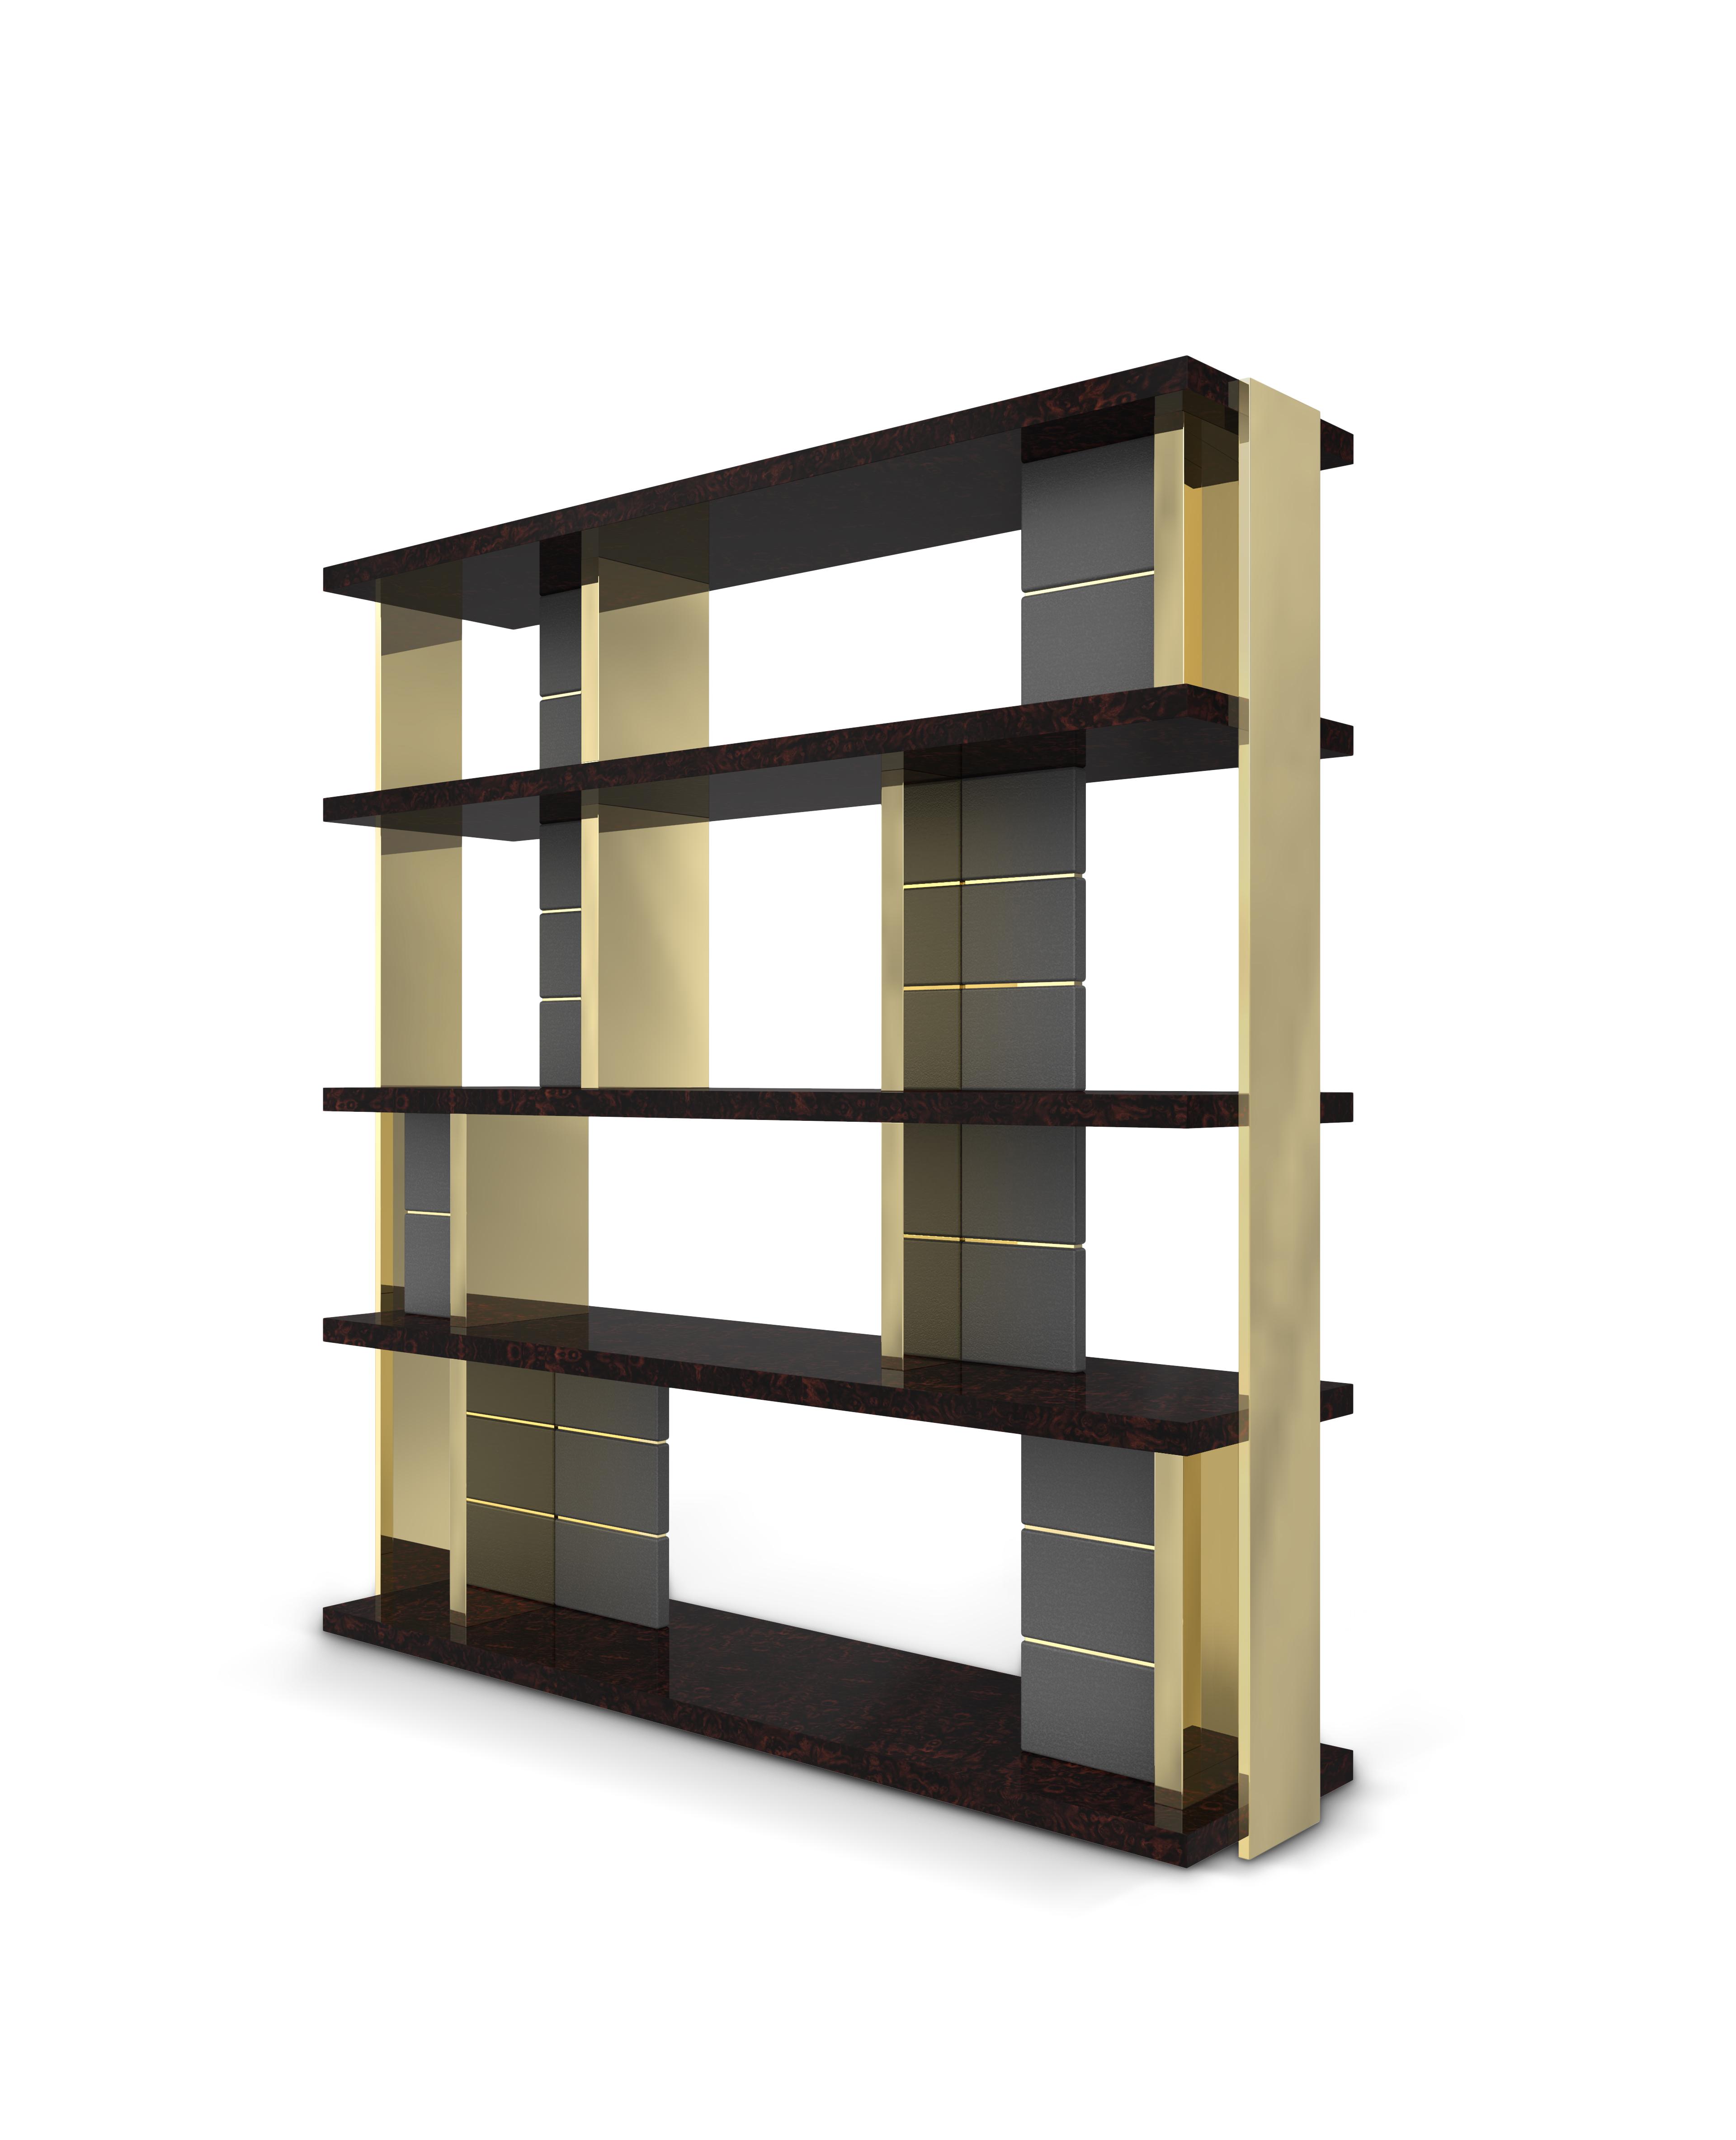 Lloyd Bookcase: Exquisite Luxury Design lloyd bookcase Lloyd Bookcase: Exquisite Luxury Design LLOYD bookcase 45